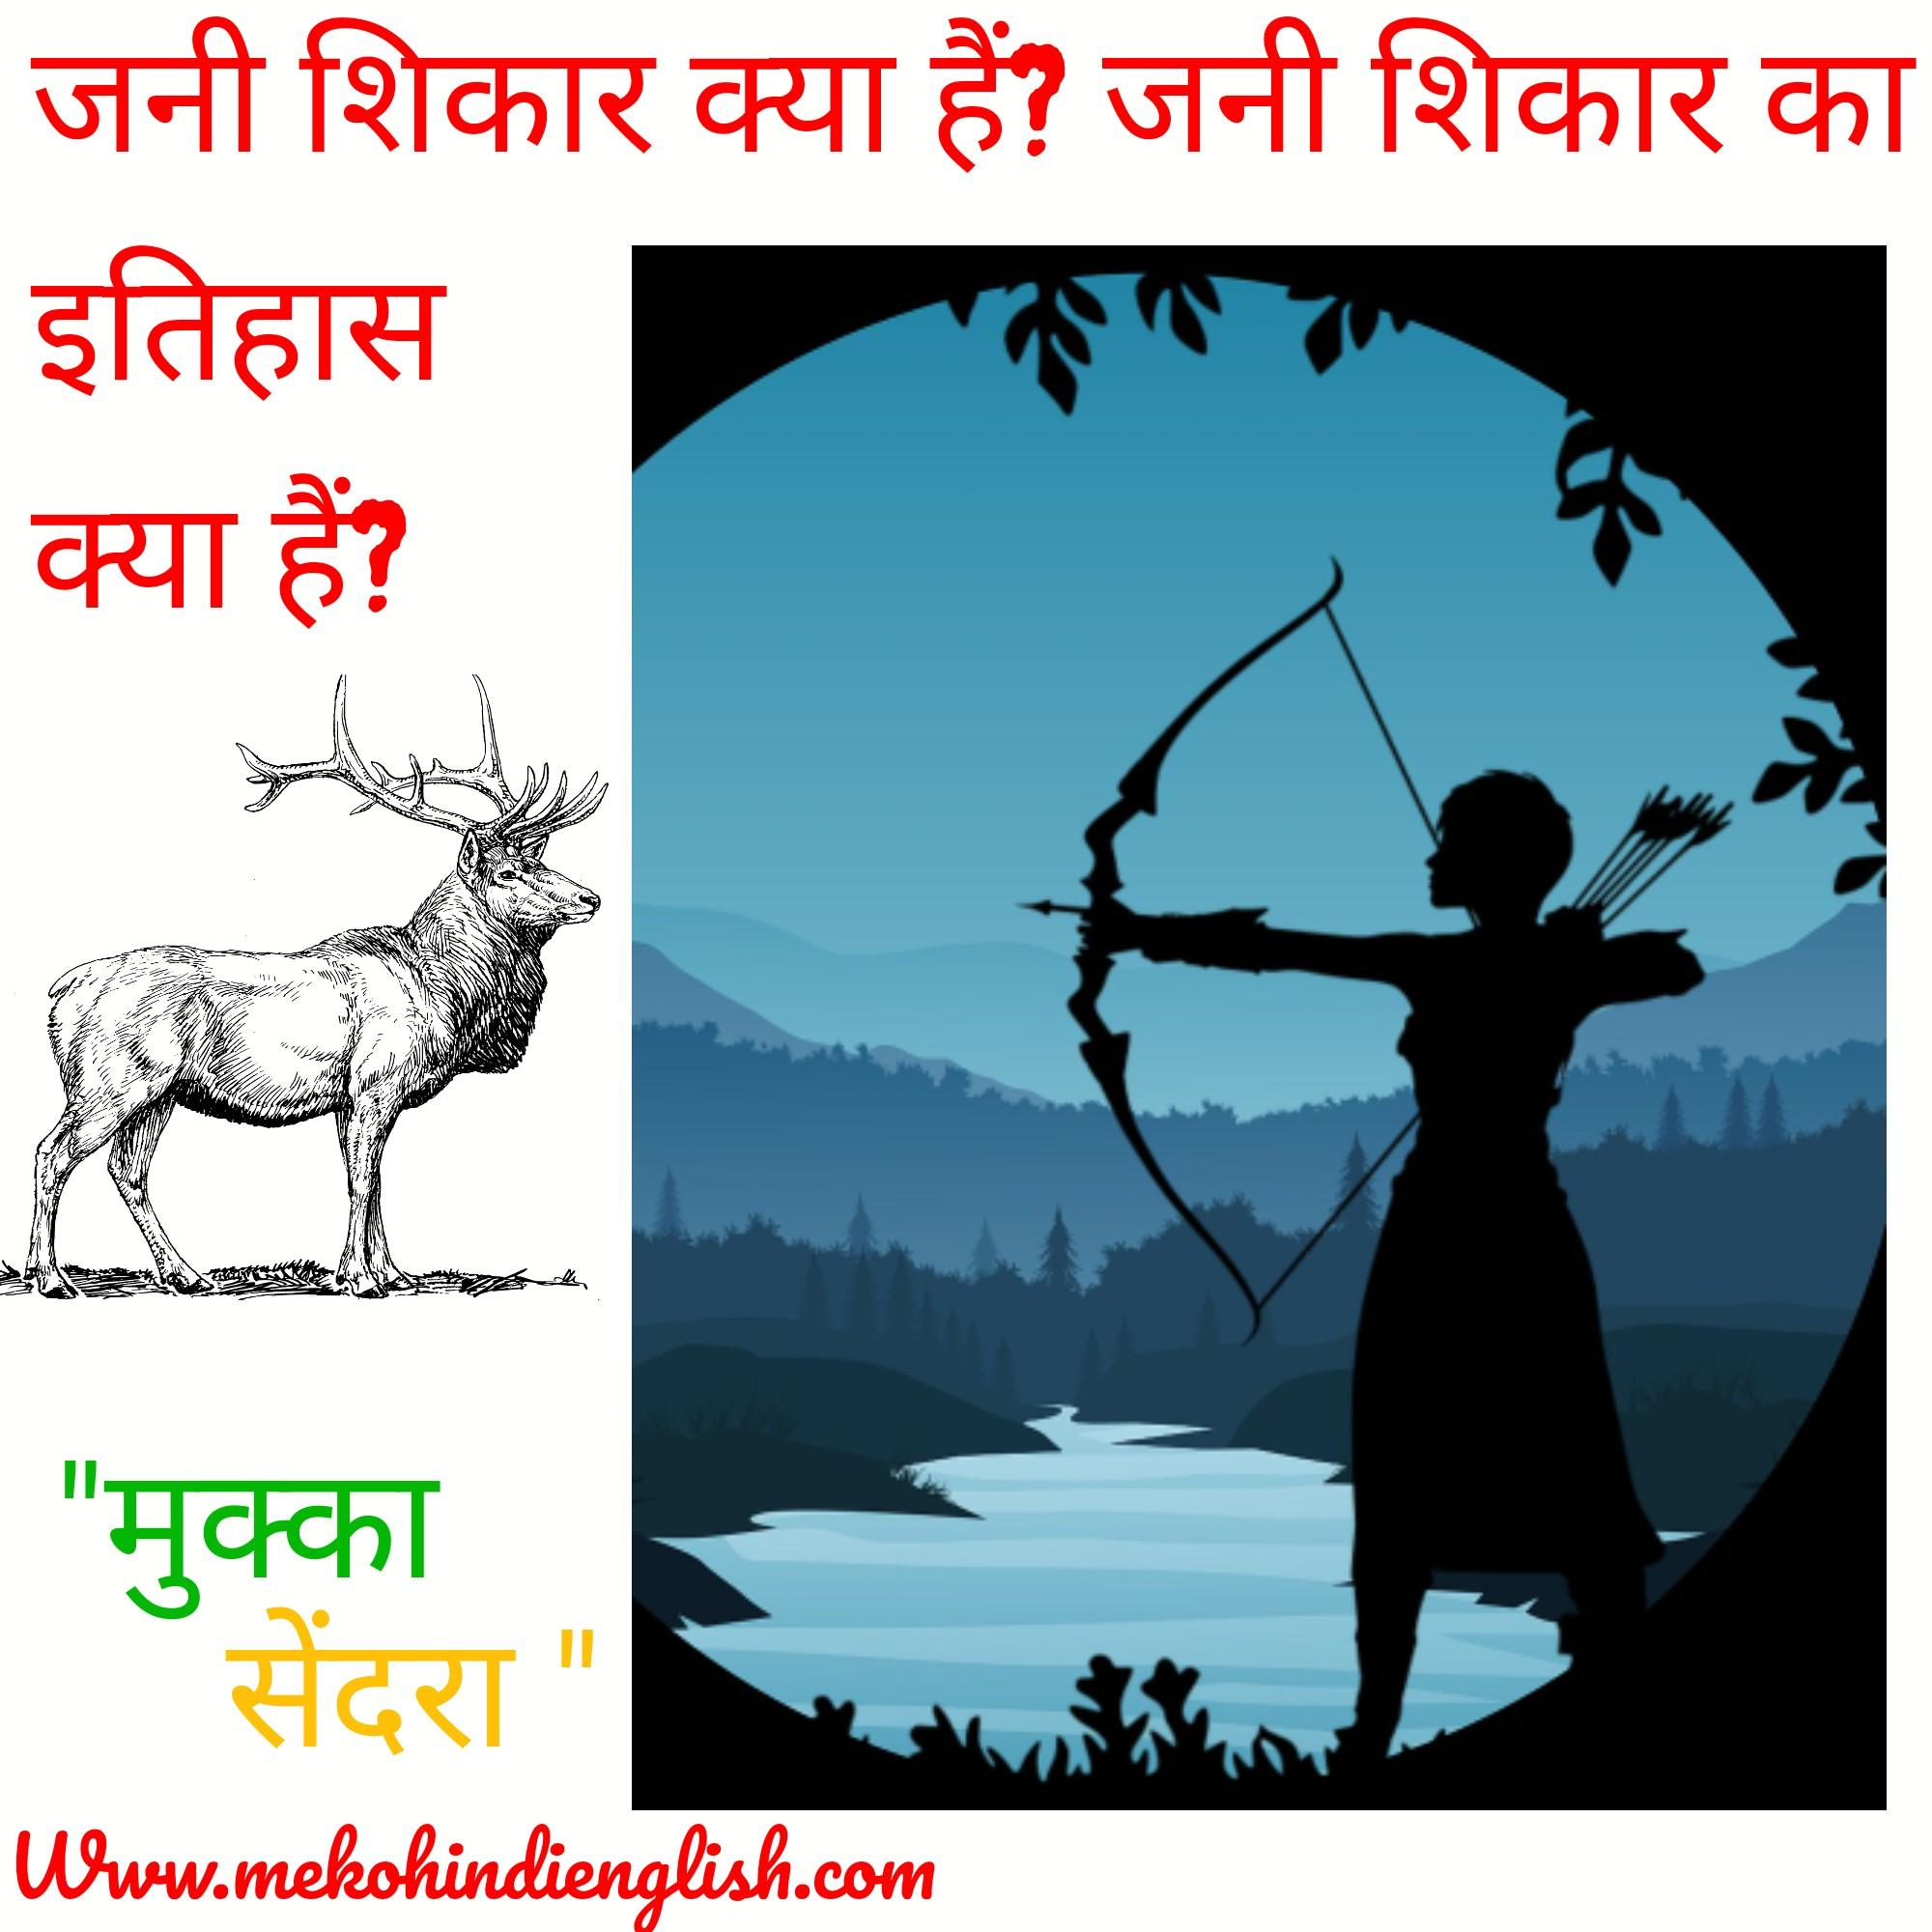 https://www.mekostudy.com/2020/10/what-is-zany-poaching-or-punching-where-did-it-begin-history%20-of-zany-shikar-hunting.html